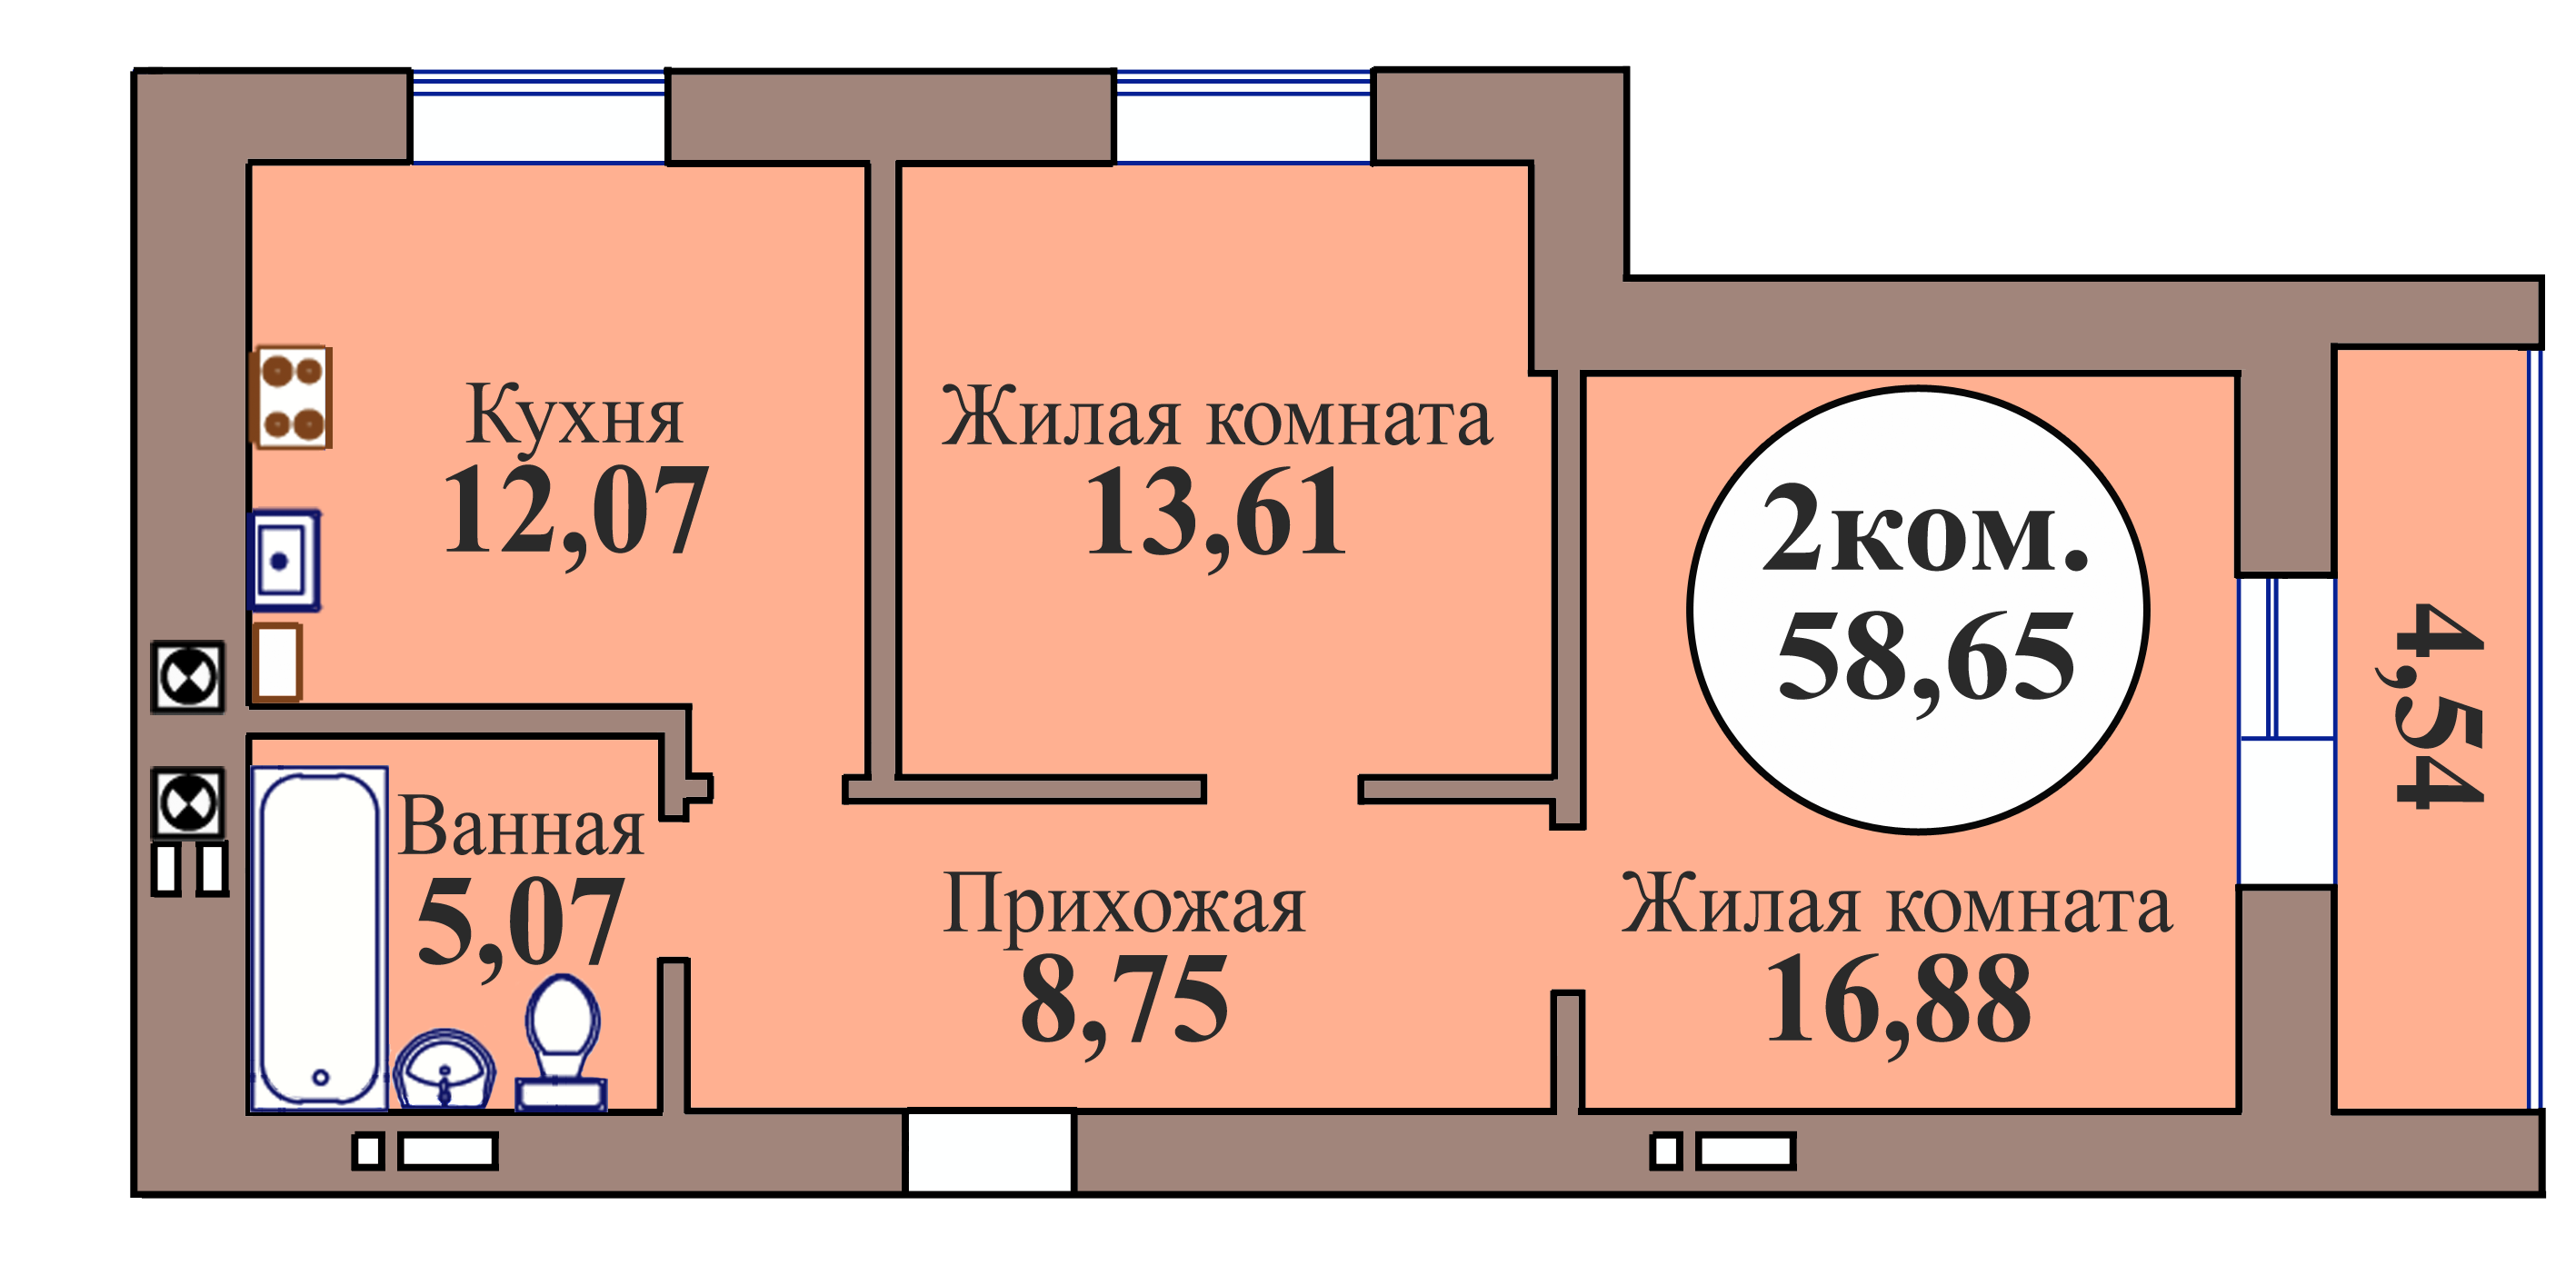 2-комн. кв. по ГП дом №3, МКР Васильково, кв. 140 в Калининграде